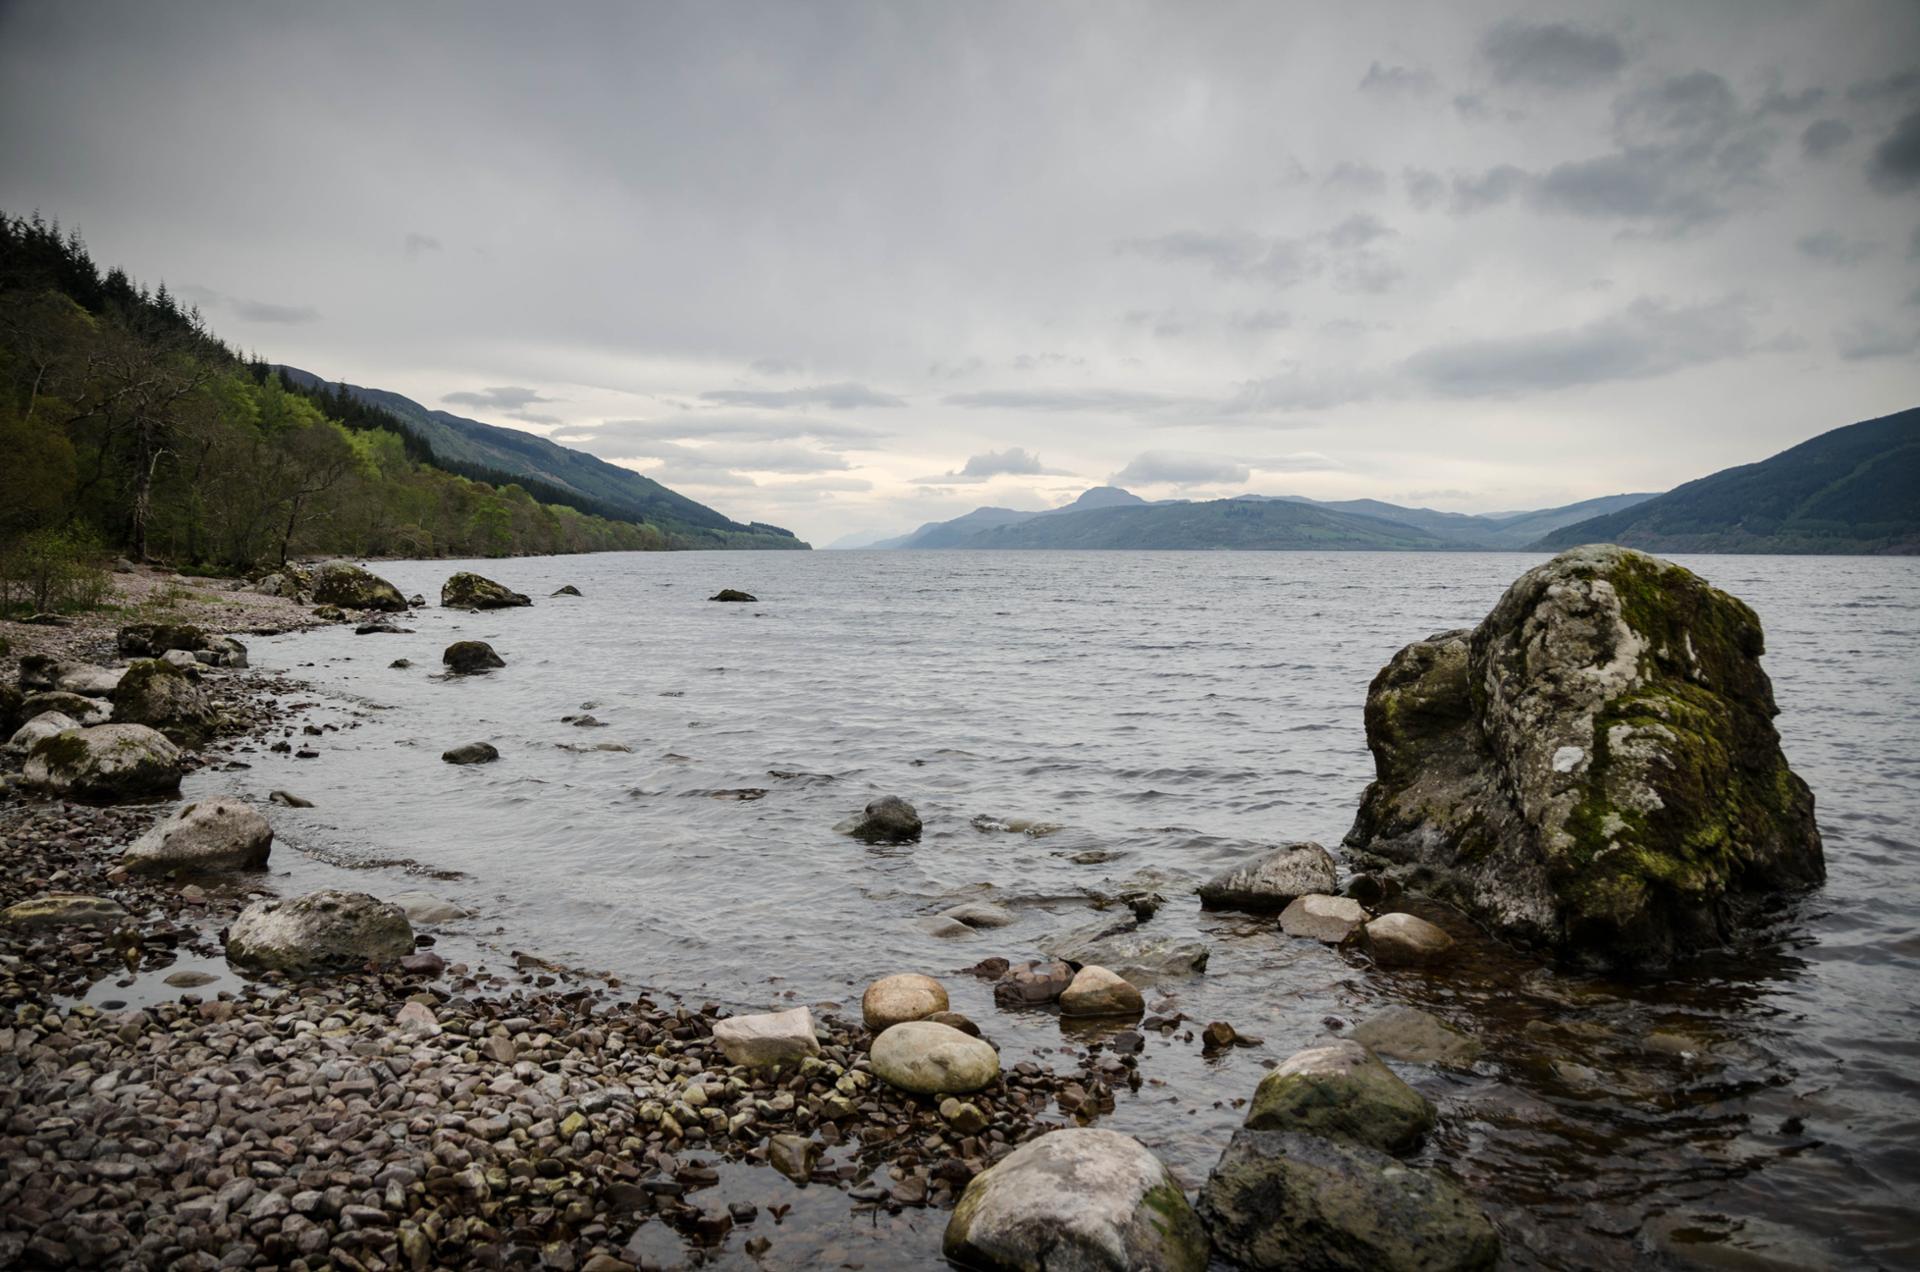 Ecosse - Loch Ness